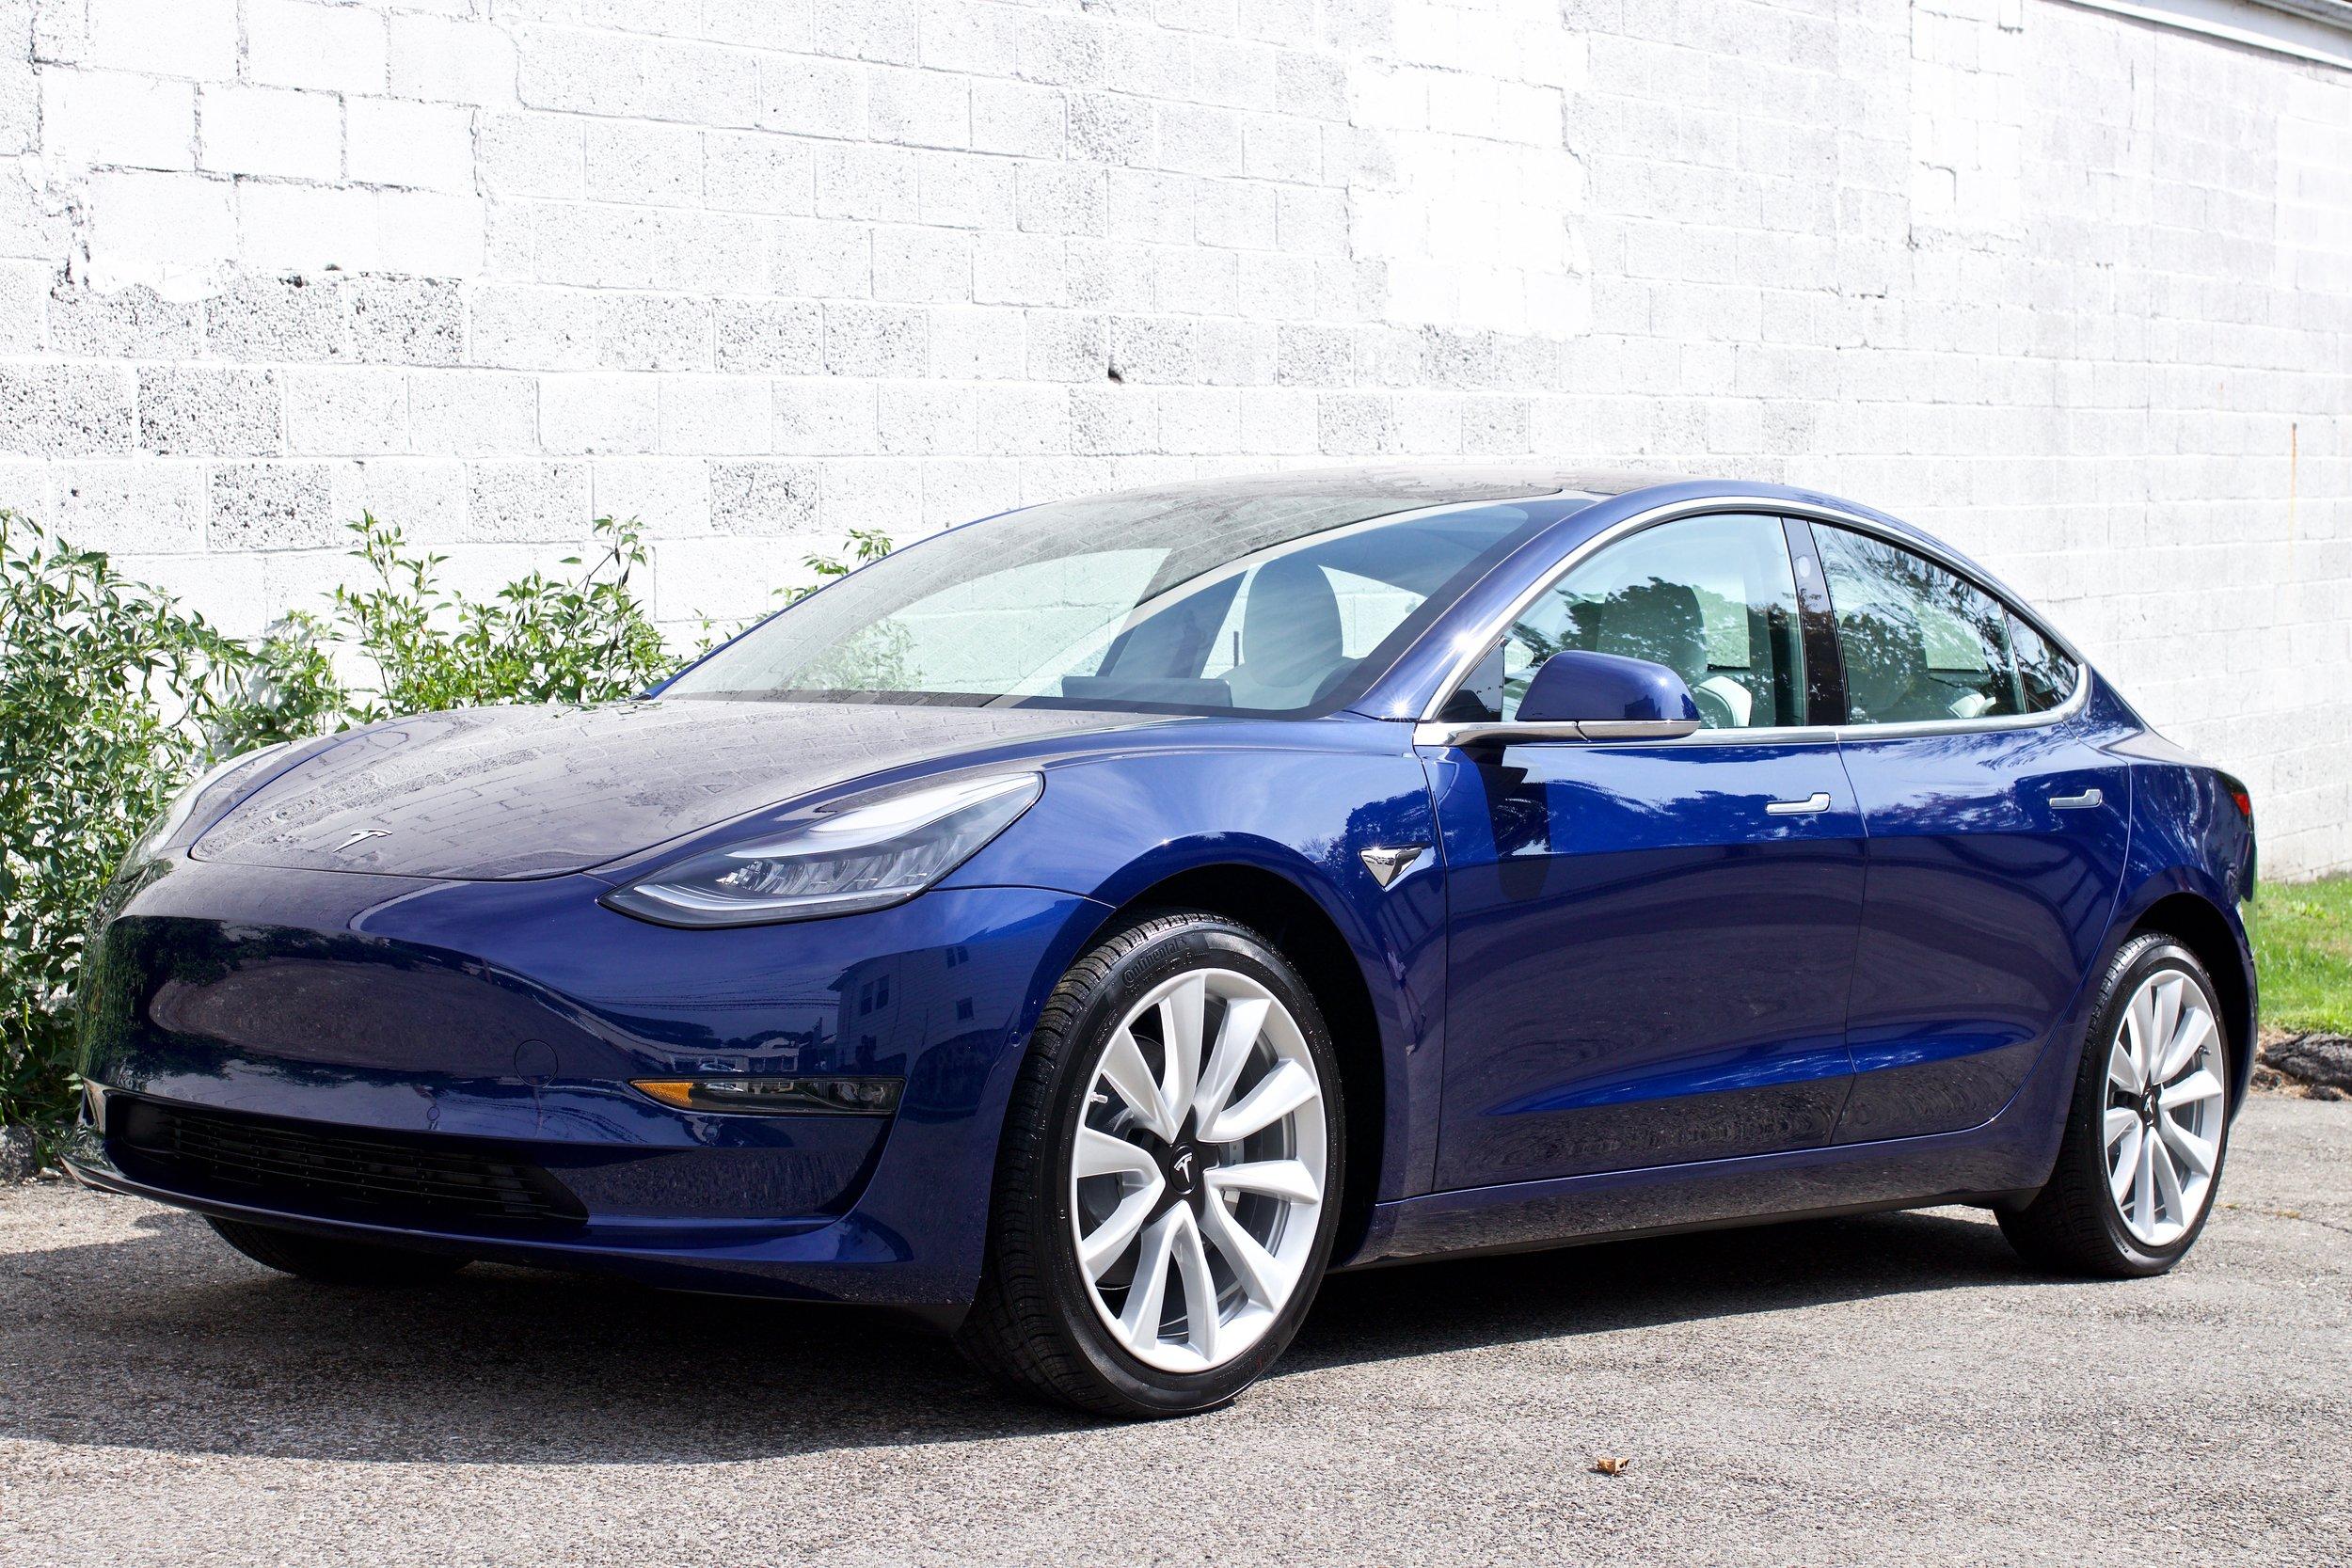 Deep Blue Metallic Tesla Model 3 - Paint Protection Film - New Car Detail - CQuartz Finest Reserve